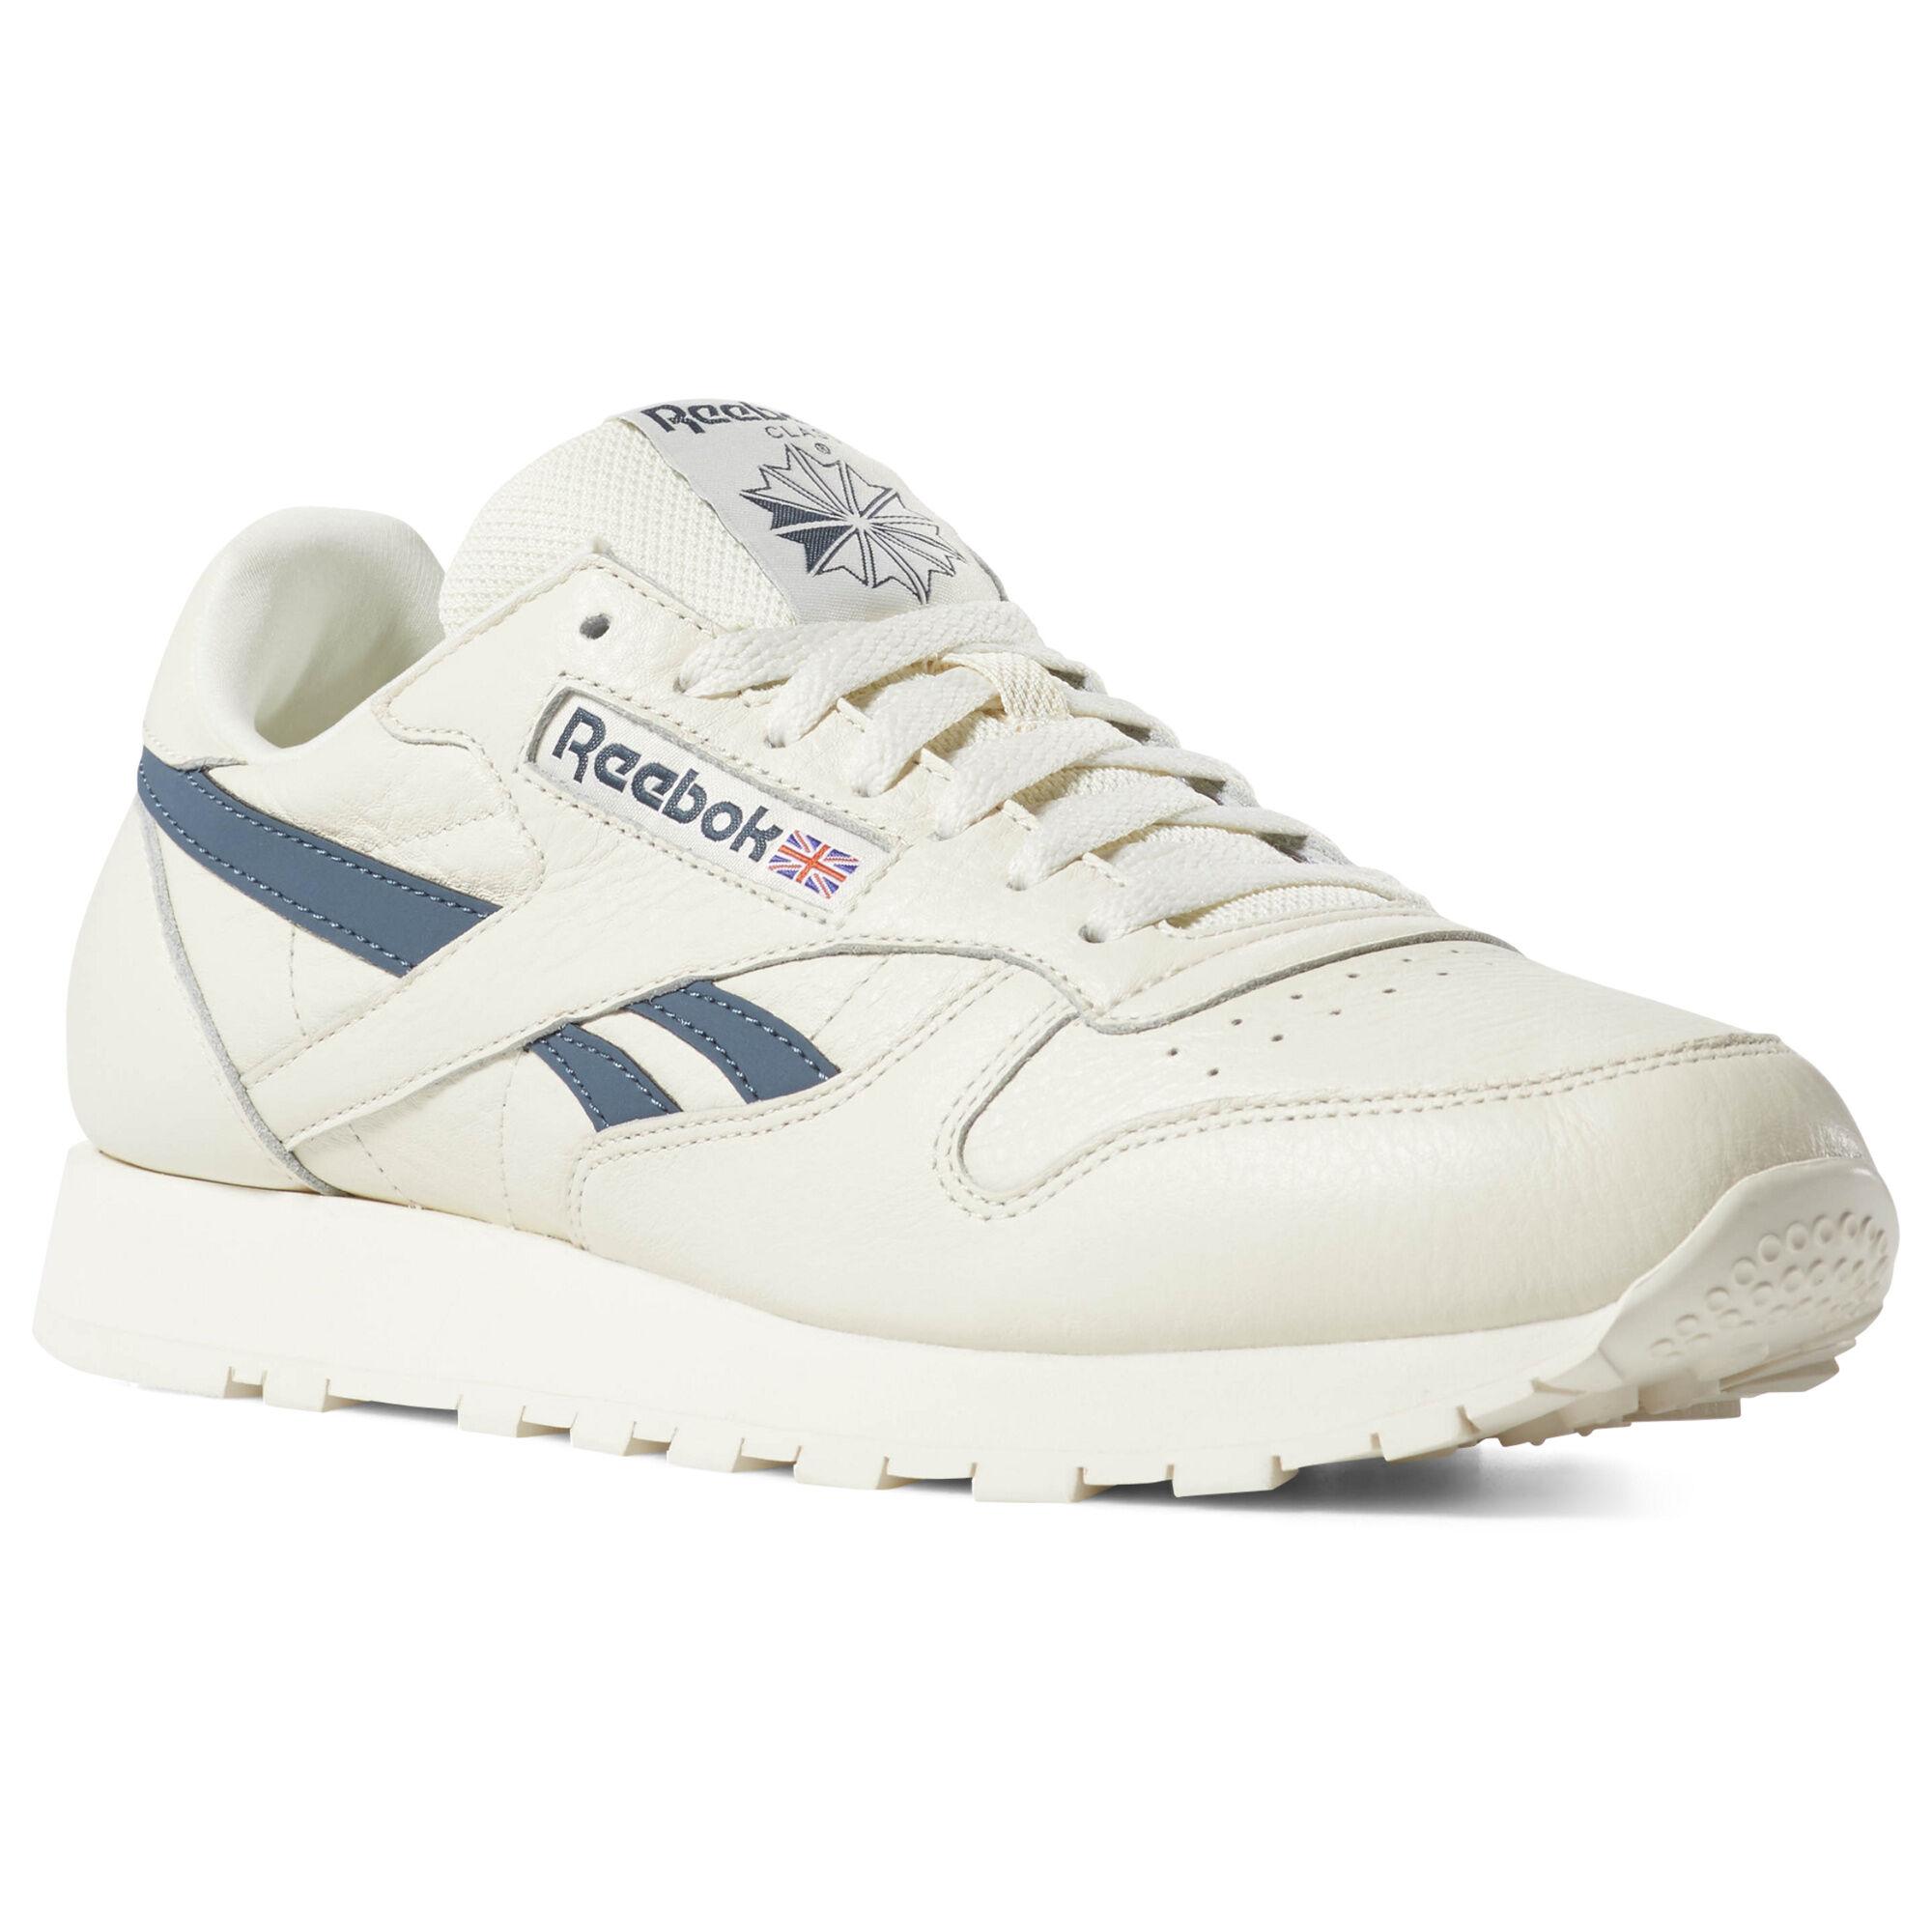 098babf8d7dd6 Reebok Classic Leather - White